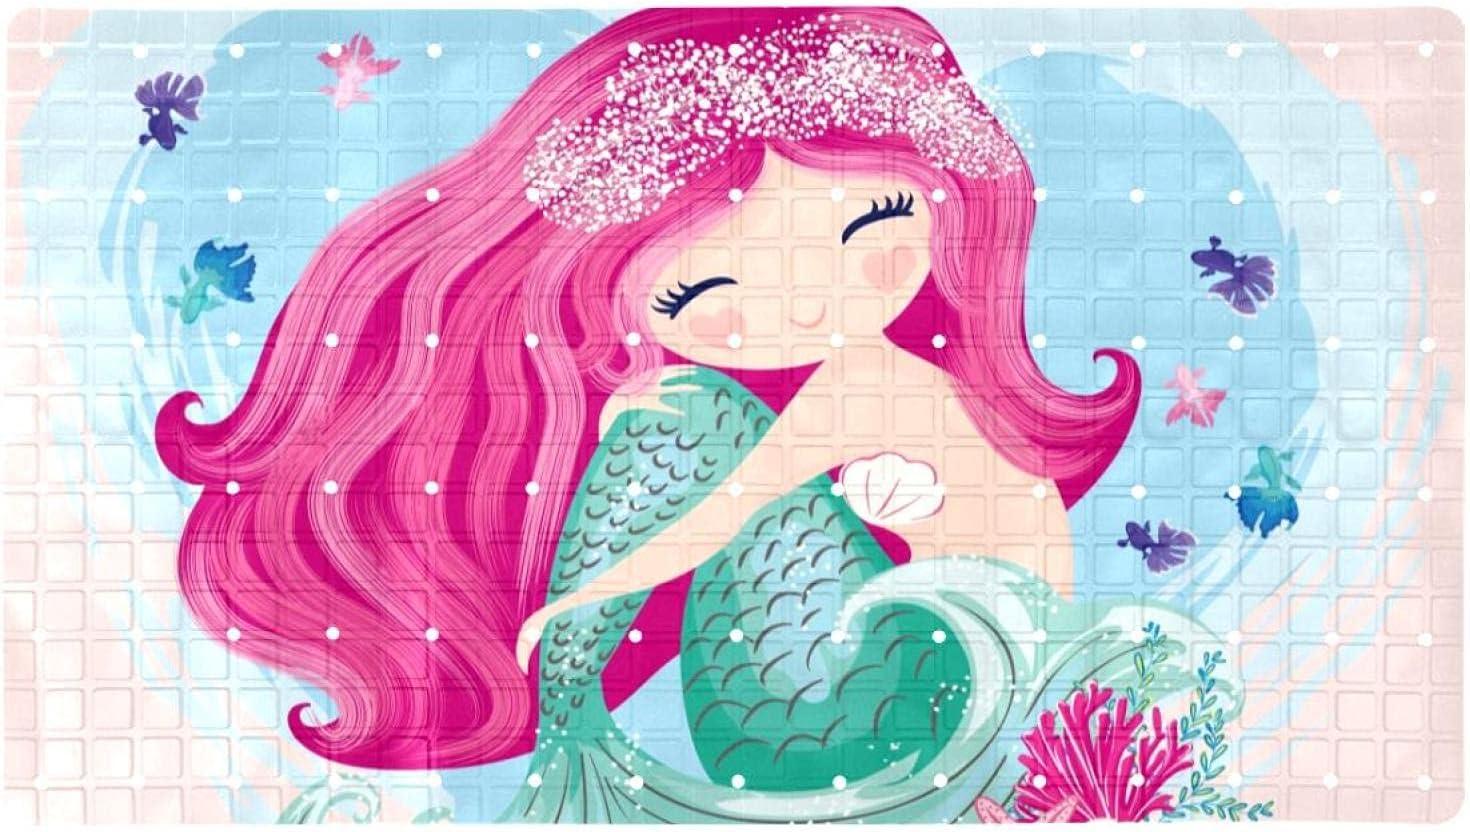 Inhomer Cheap mail order sales High quality new Non-Slip Bathtub Mats Beauty Prints Ba Mermaid Girl Soft